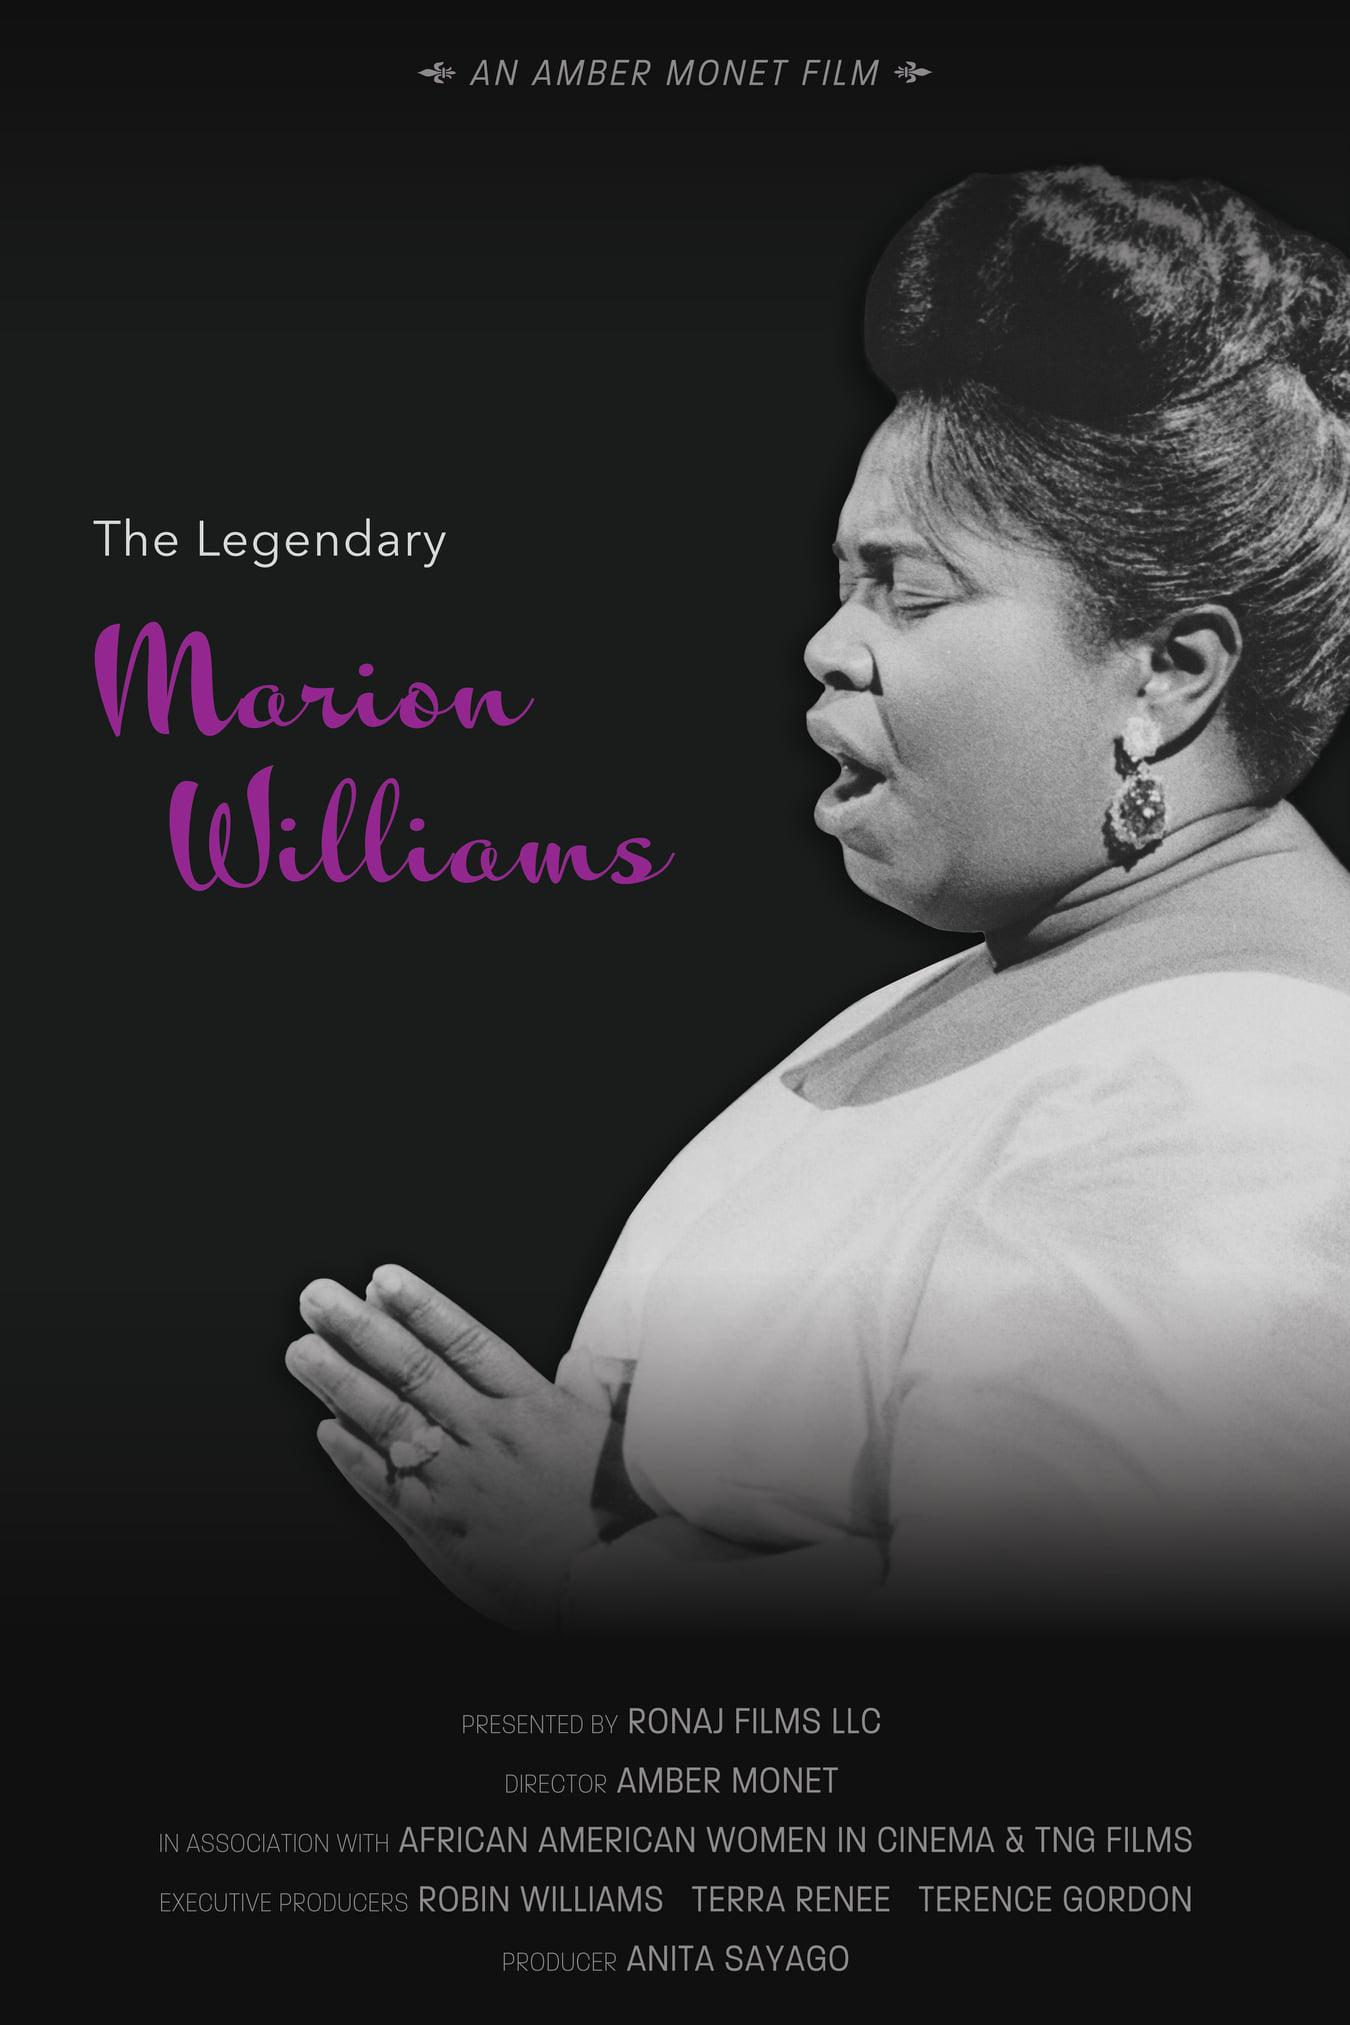 Gospel Music Heritage Month: Honoring the Legendary Marion Williams